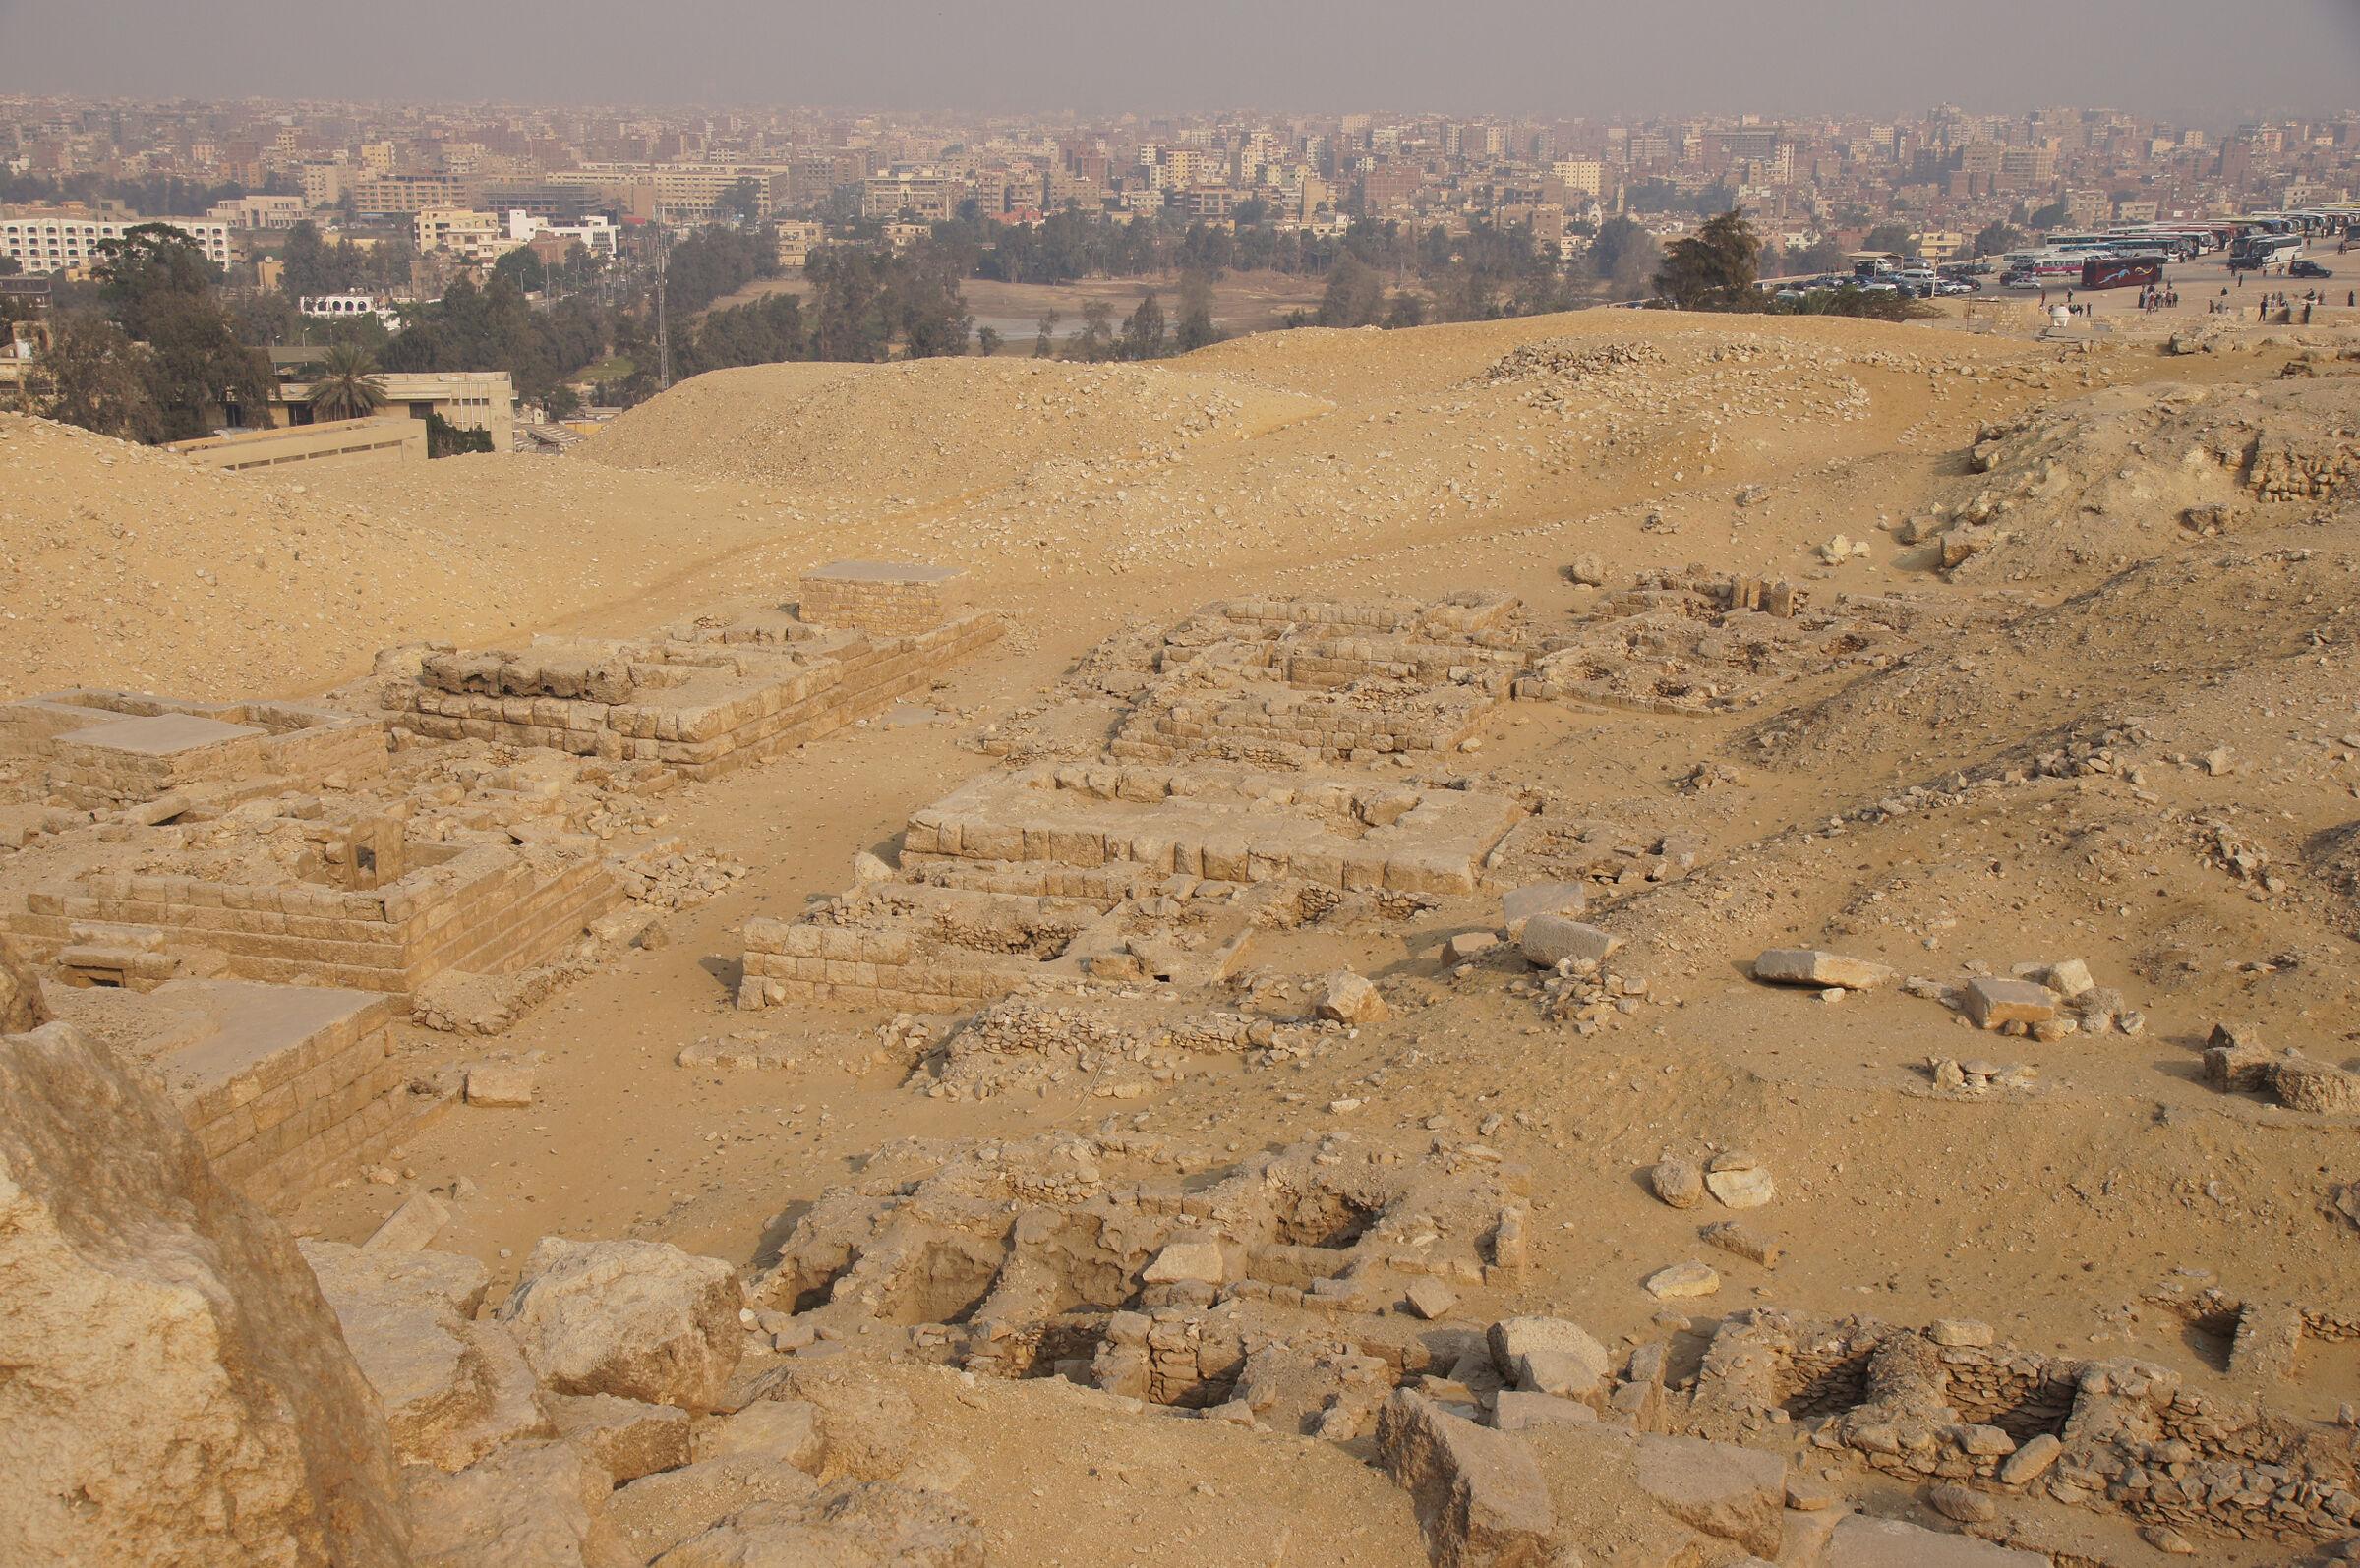 Western Cemetery: Site: Giza; View: G 2088, G 2087, G 2086, G 2084, G 2230+2231, G 2501, G 2502, G 2077, G 2076, G 2075, G 2072, G 2072a, G 2074, G 2071, G 2061, G 2234, G 2235, G 2236, G 2232, G 2233, G 2238, G 2239, G 2509